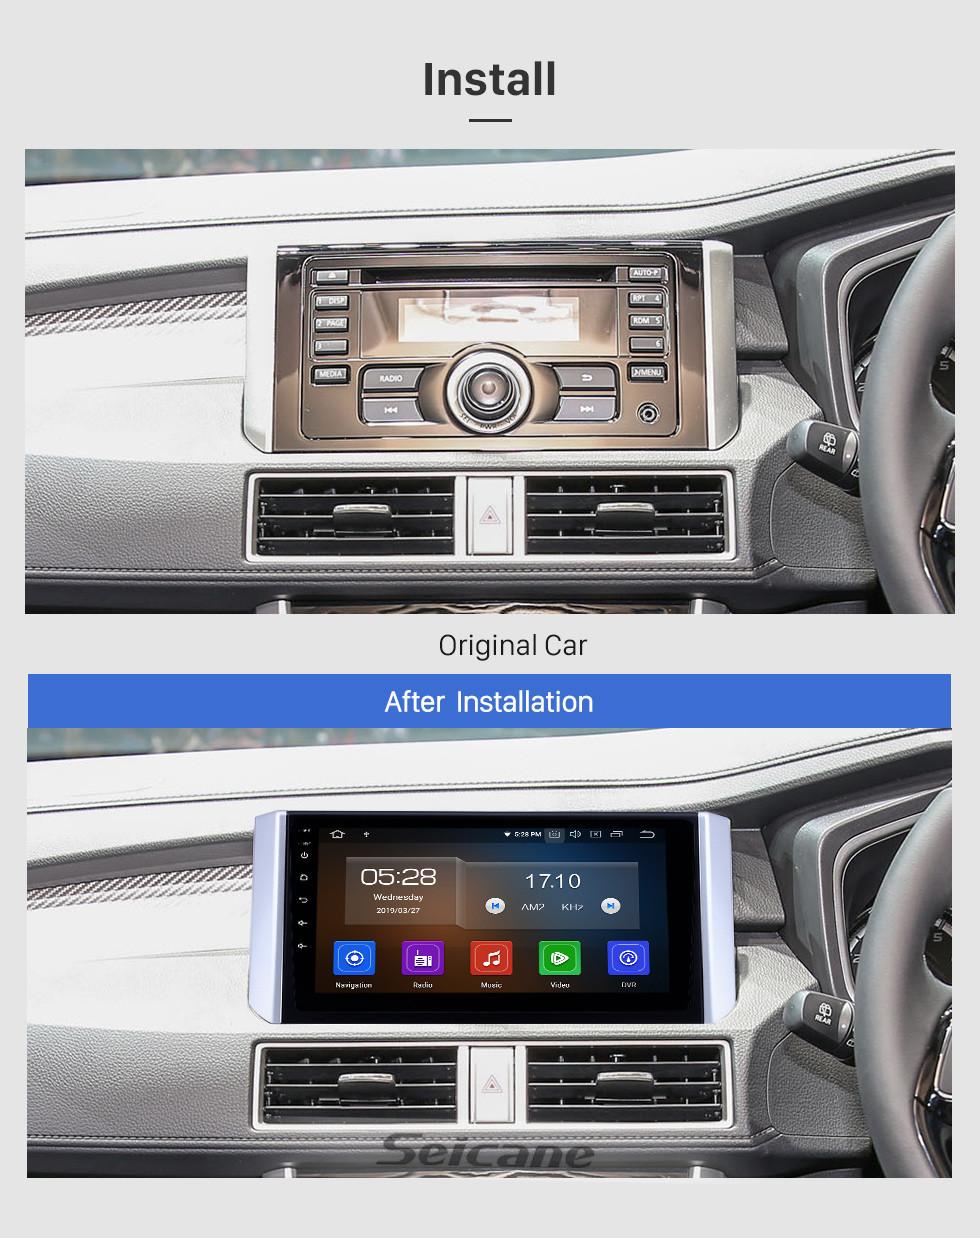 Seicane 2017-2018 Mitsubishi Xpander Android 10.0 9 inch GPS Navigation Radio Bluetooth HD Touchscreen USB Carplay Music AUX support TPMS OBD2 Digital TV